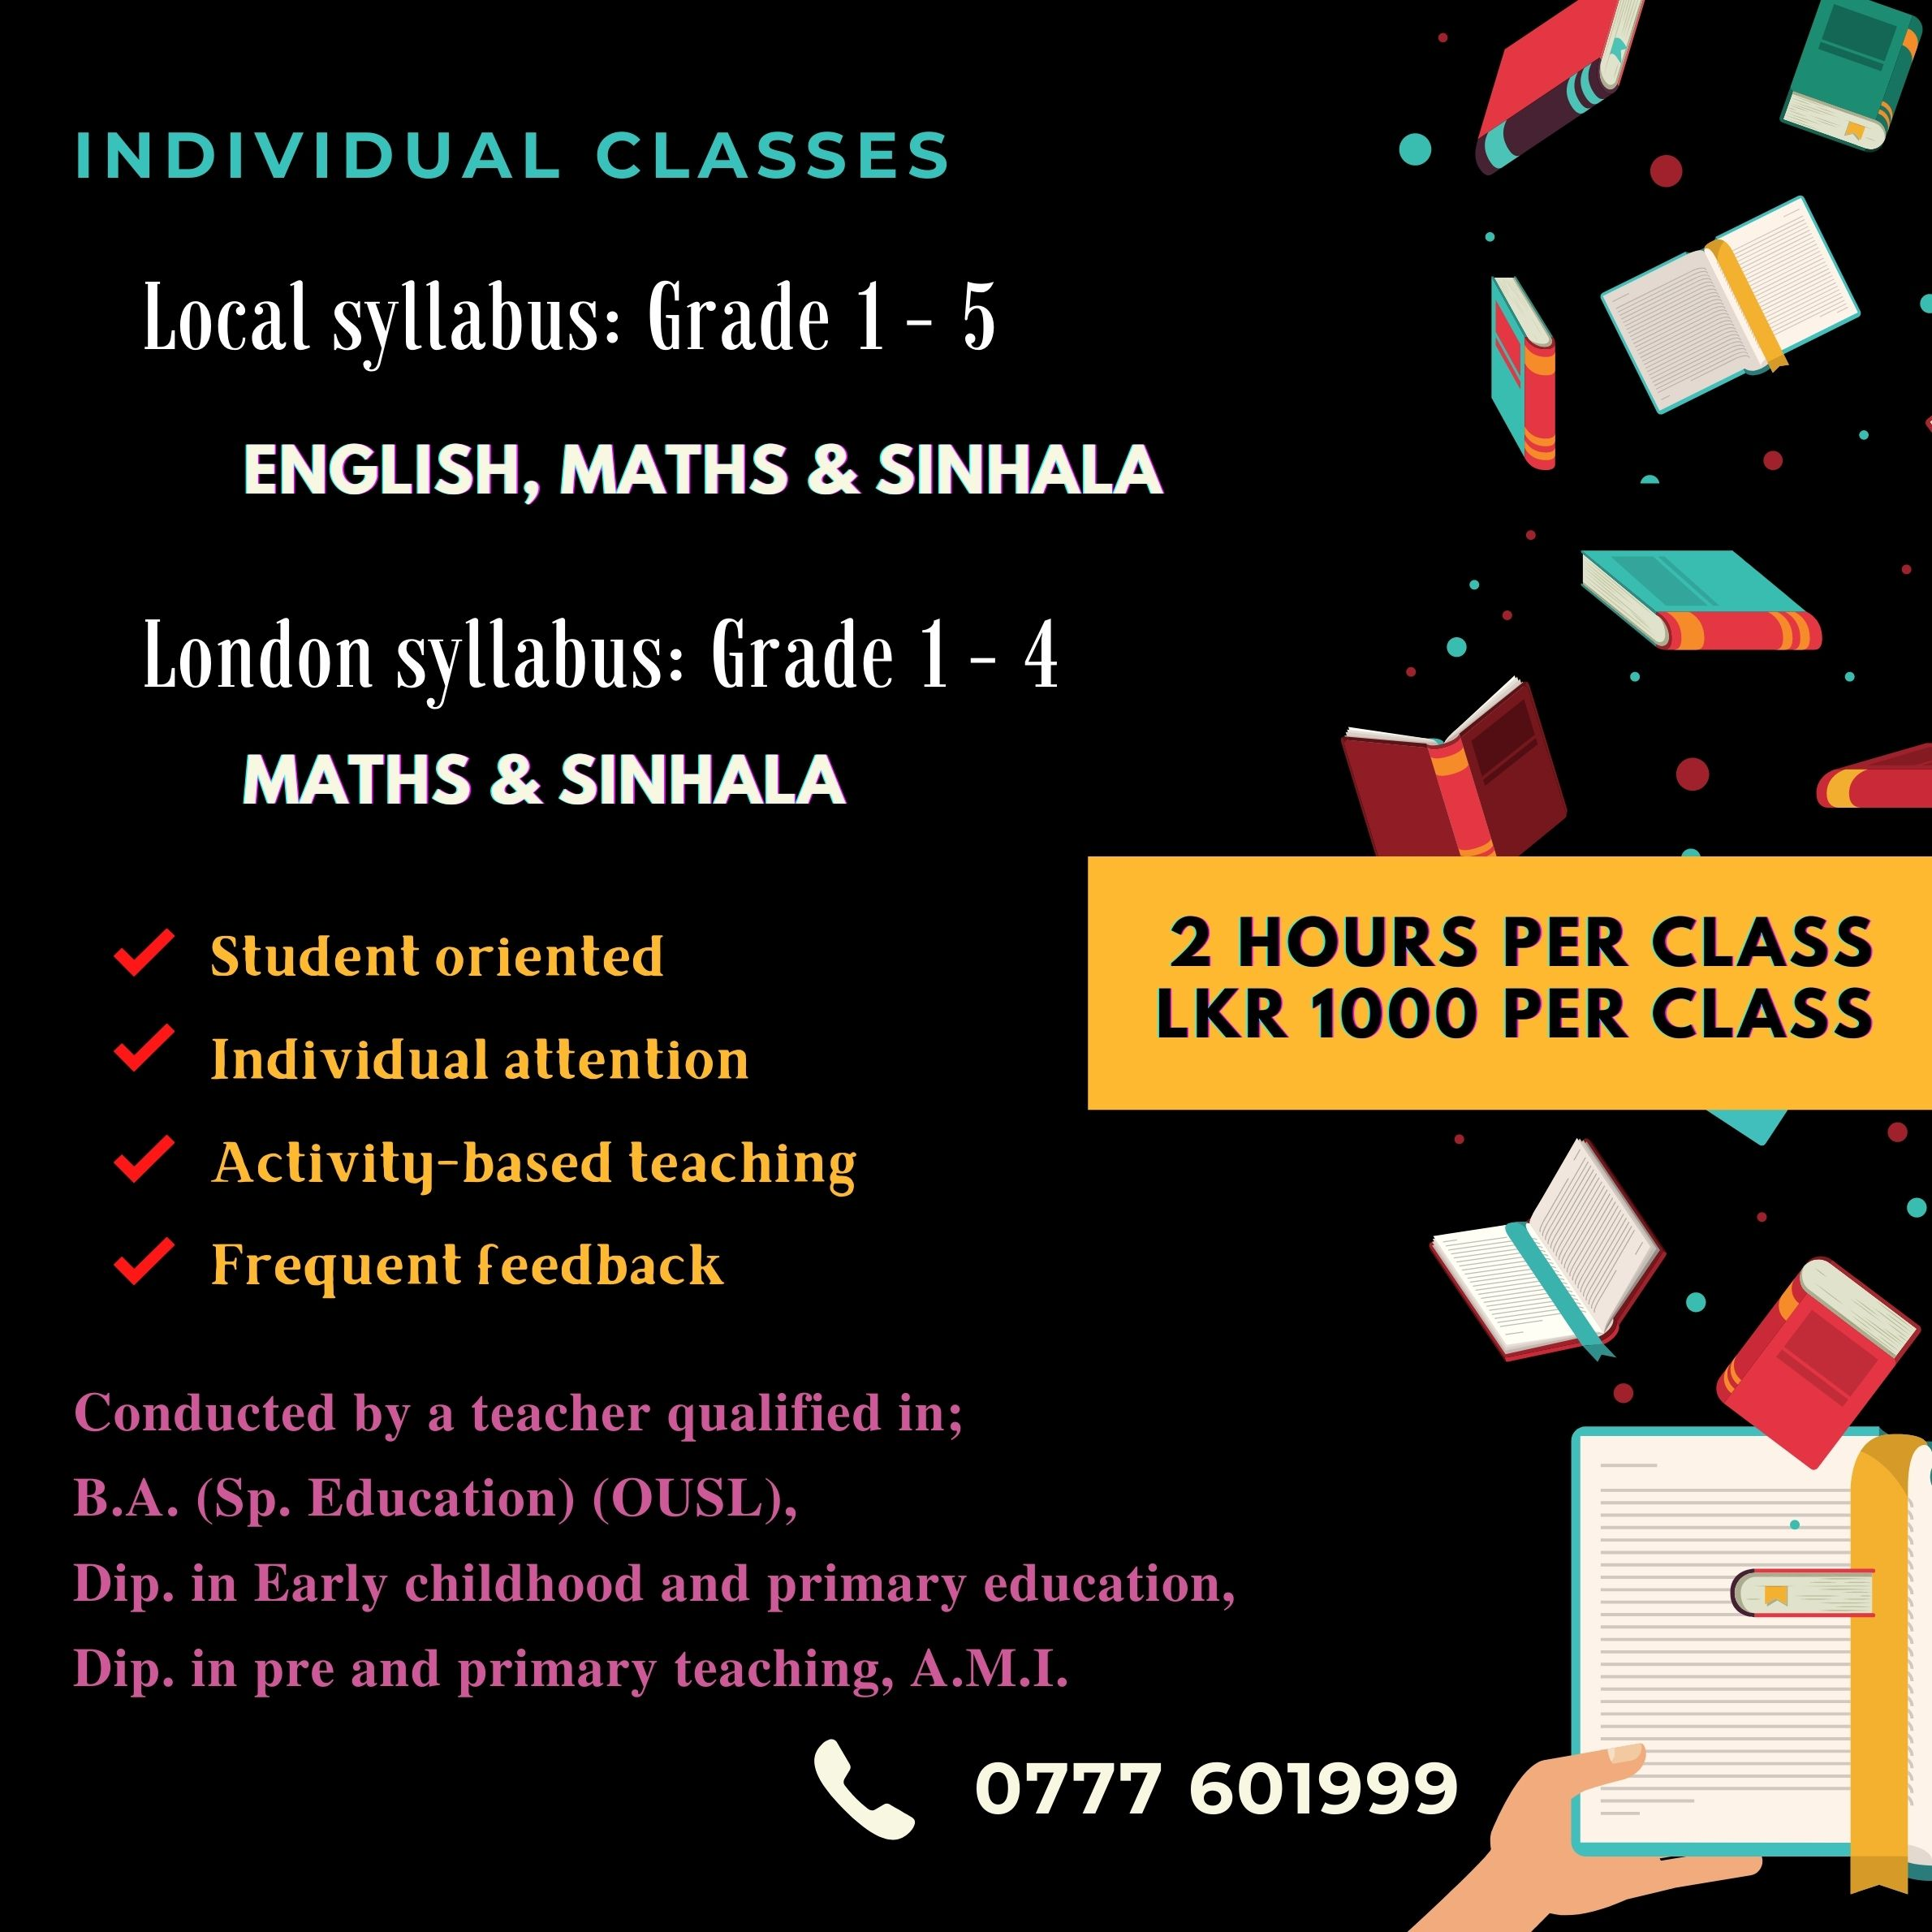 Grade 1 to 5 Individual Classes (Local and International syllabus)